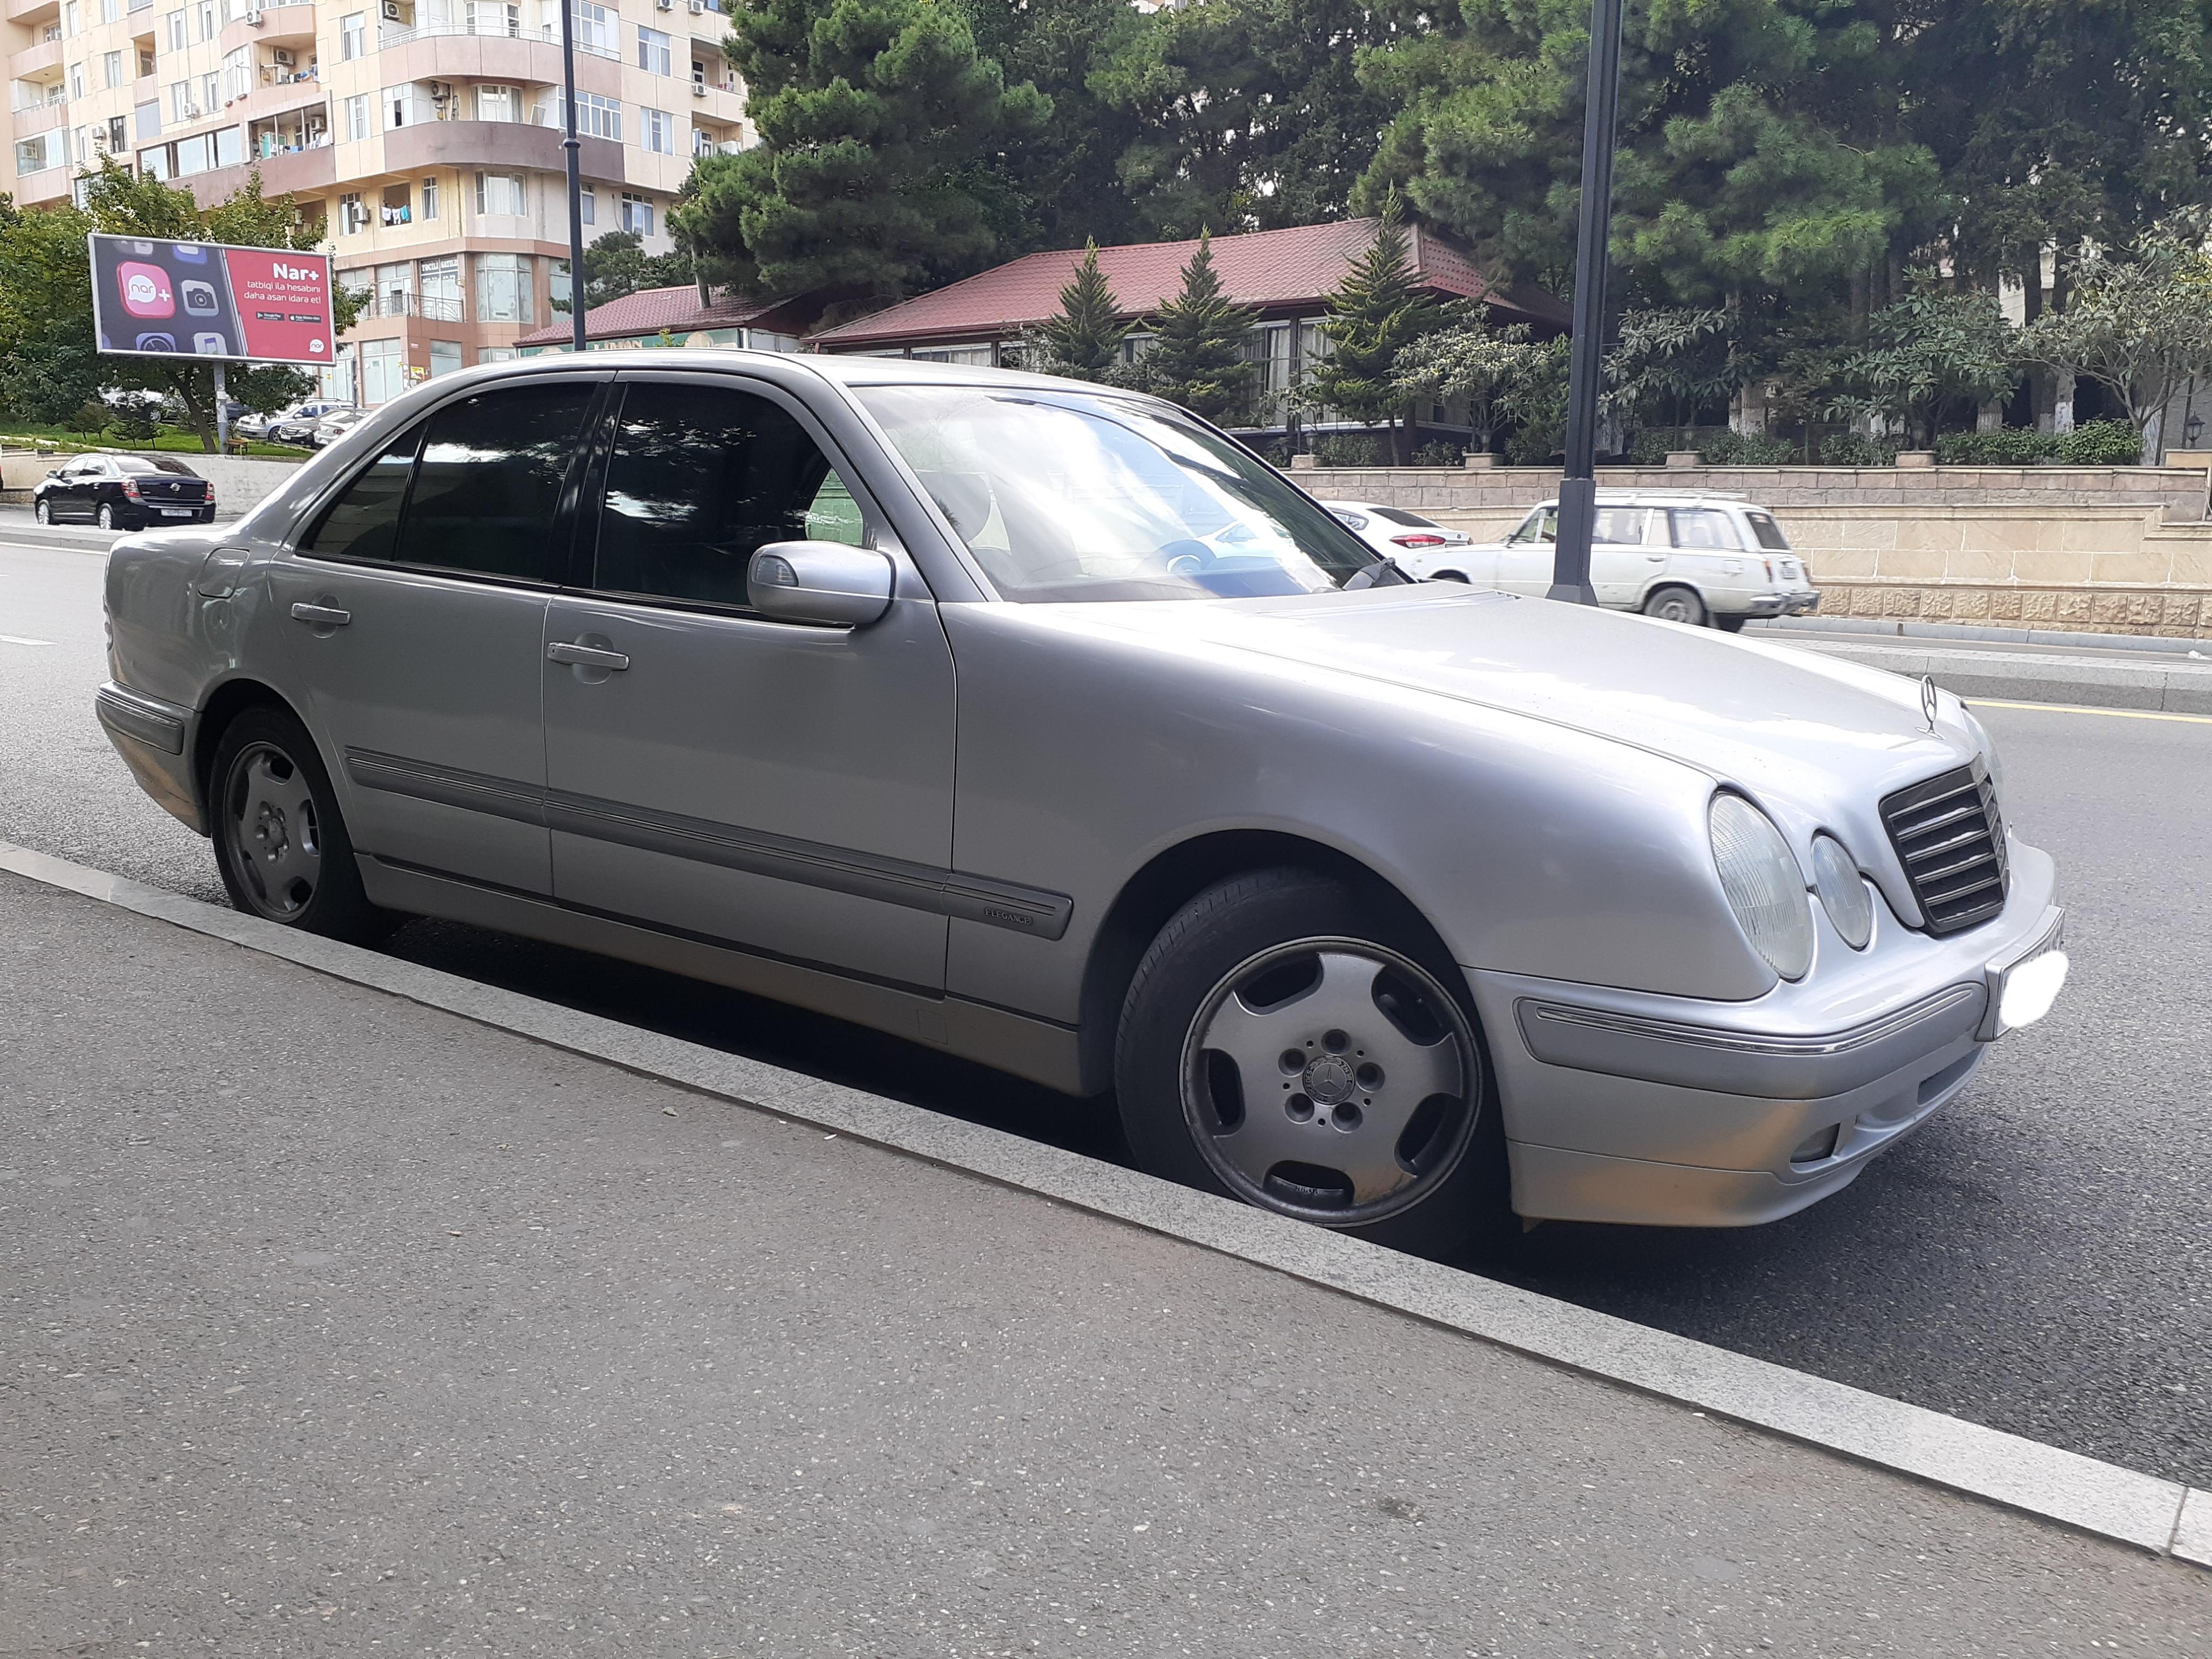 Mercedes-Benz E 240 2.4(lt) 2000 Подержанный  $8235